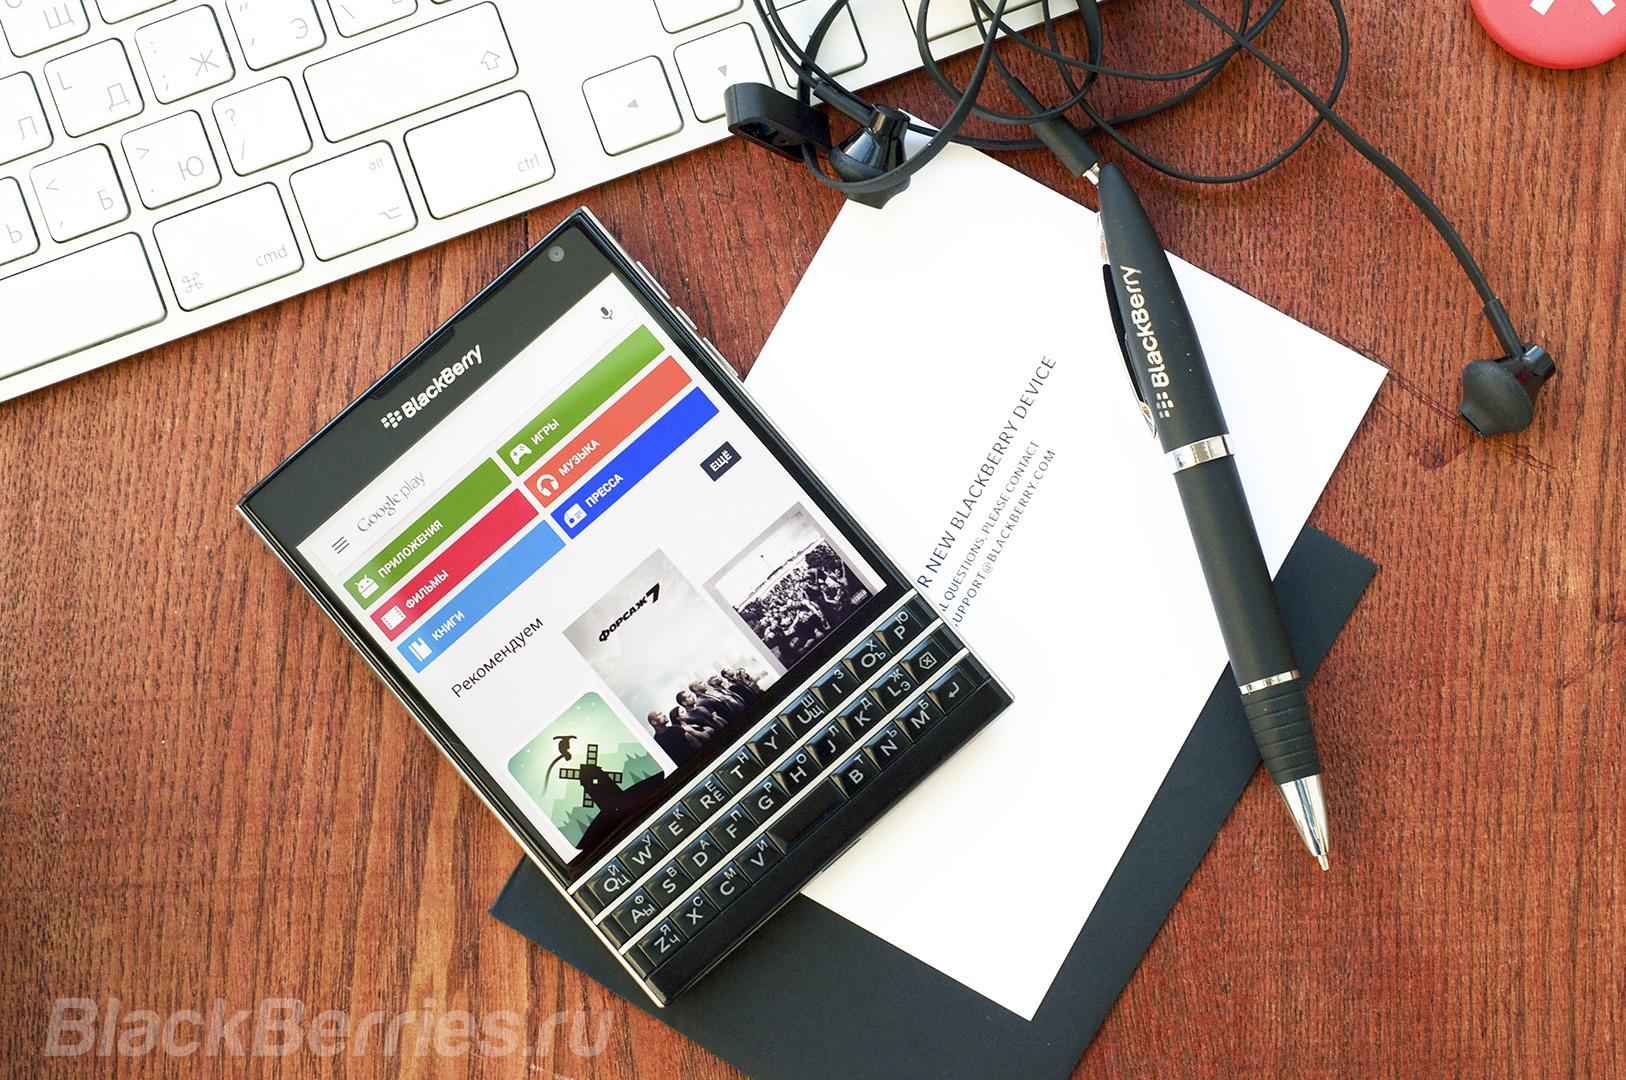 BlackBerry-Passport-Review-2016-33